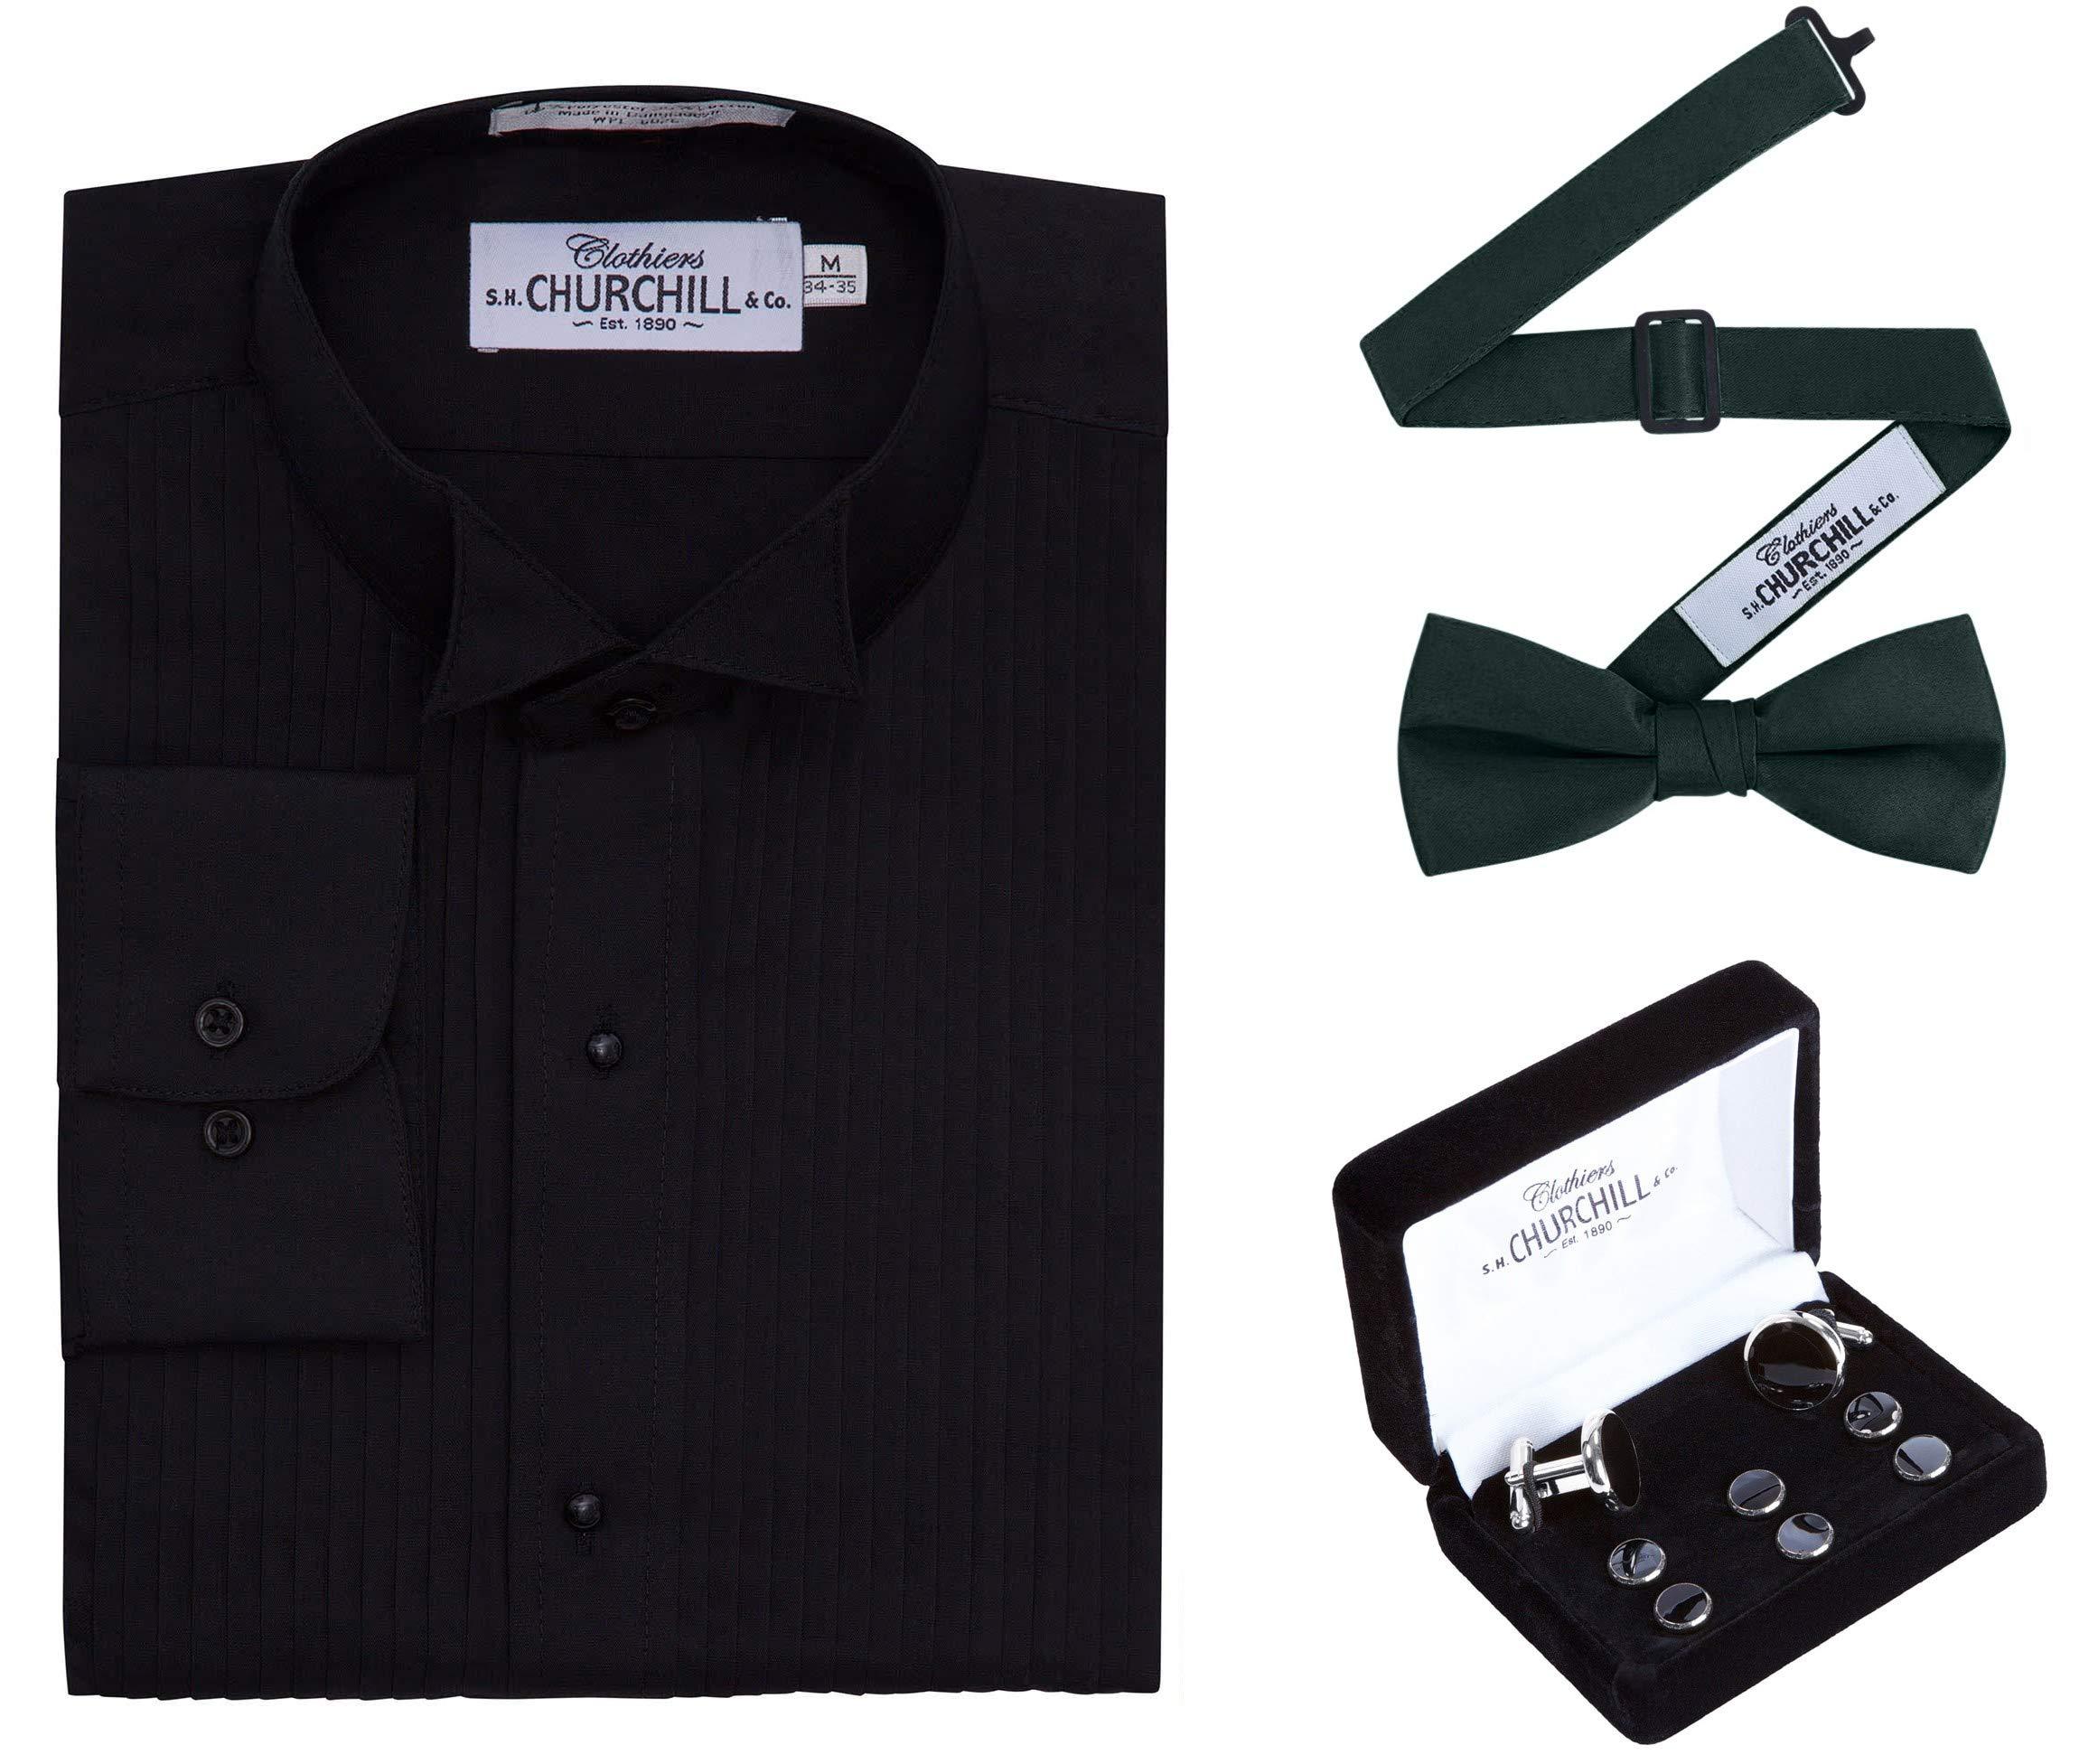 Men's Black Wing Tux Shirt, Hunter Bowtie & Silver Stud Set (14 32/33) by S.H. Churchill & Co.